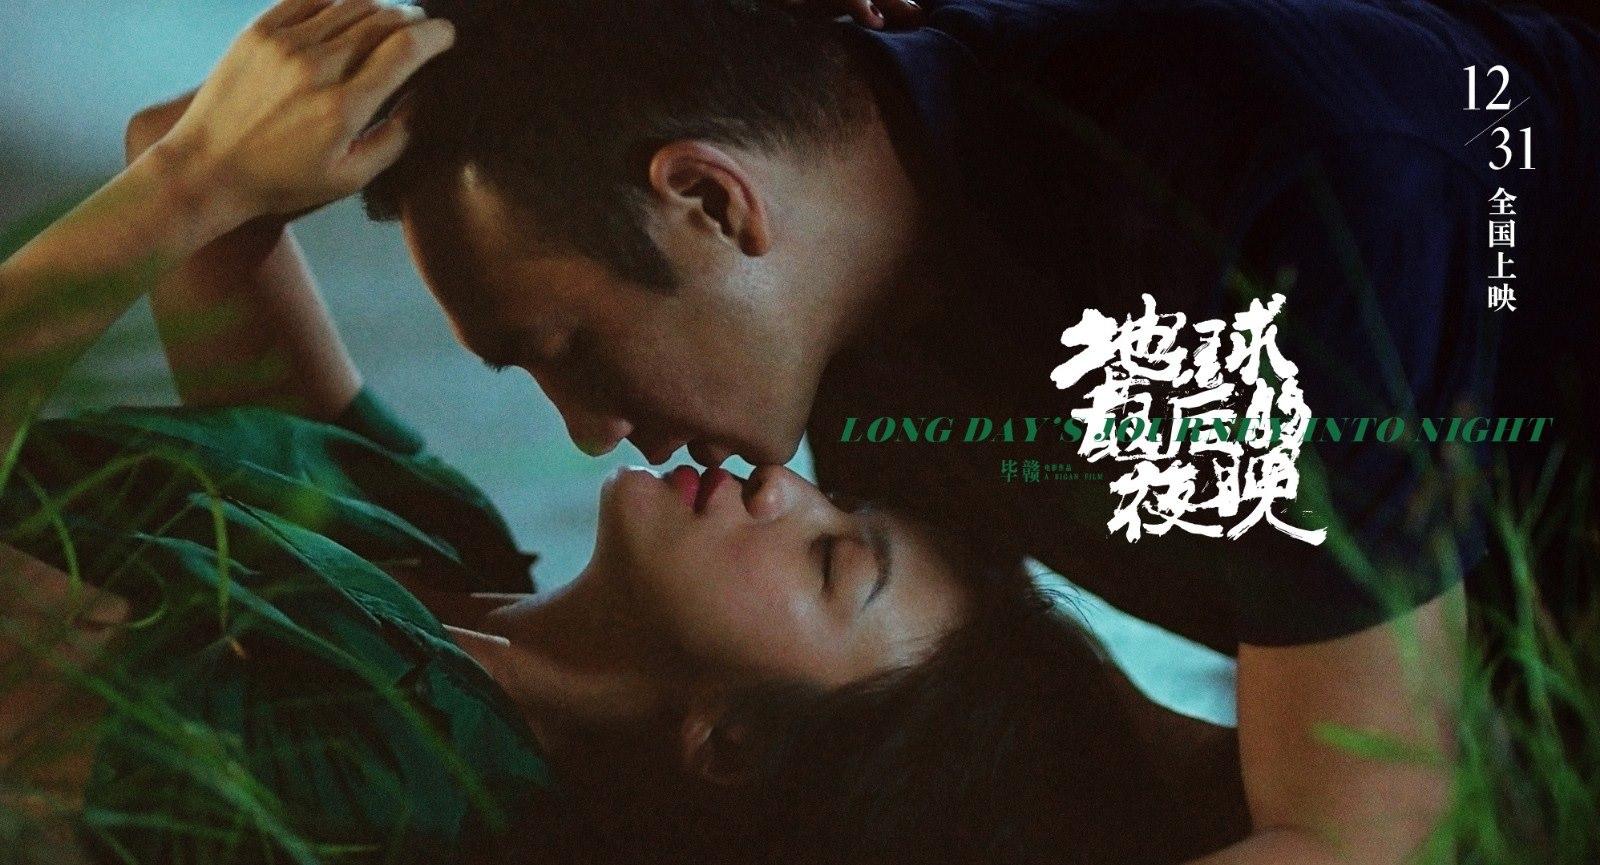 Movie, 地球最后的夜晚(中國, 2018年) / 地球最後的夜晚(台灣) / Long Day's Journey Into Night(英文), 電影海報, 中國, 橫版